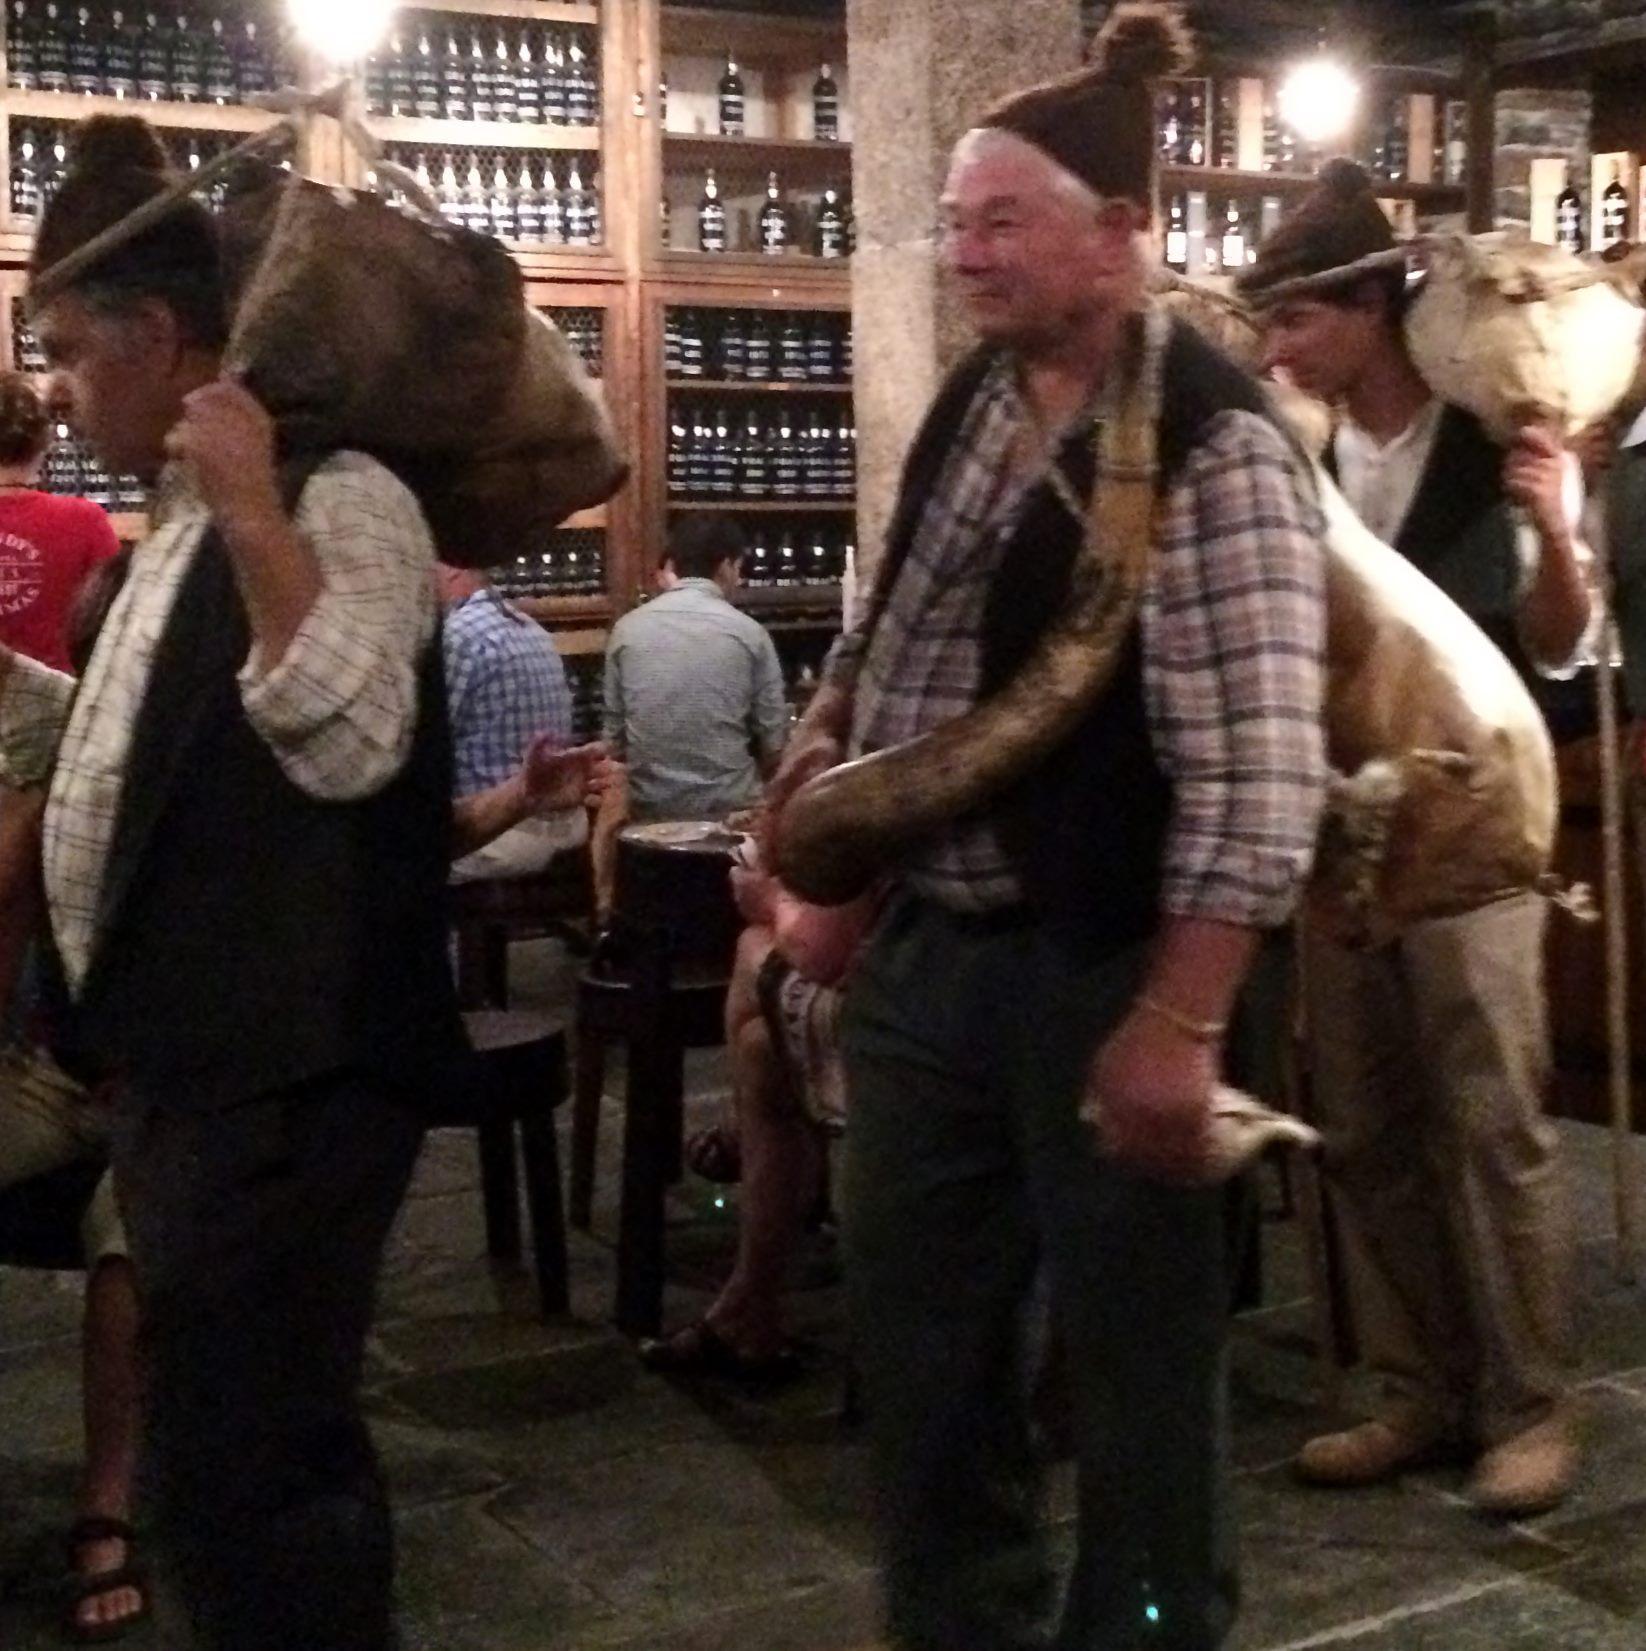 Wine skins arriving at Blandy's